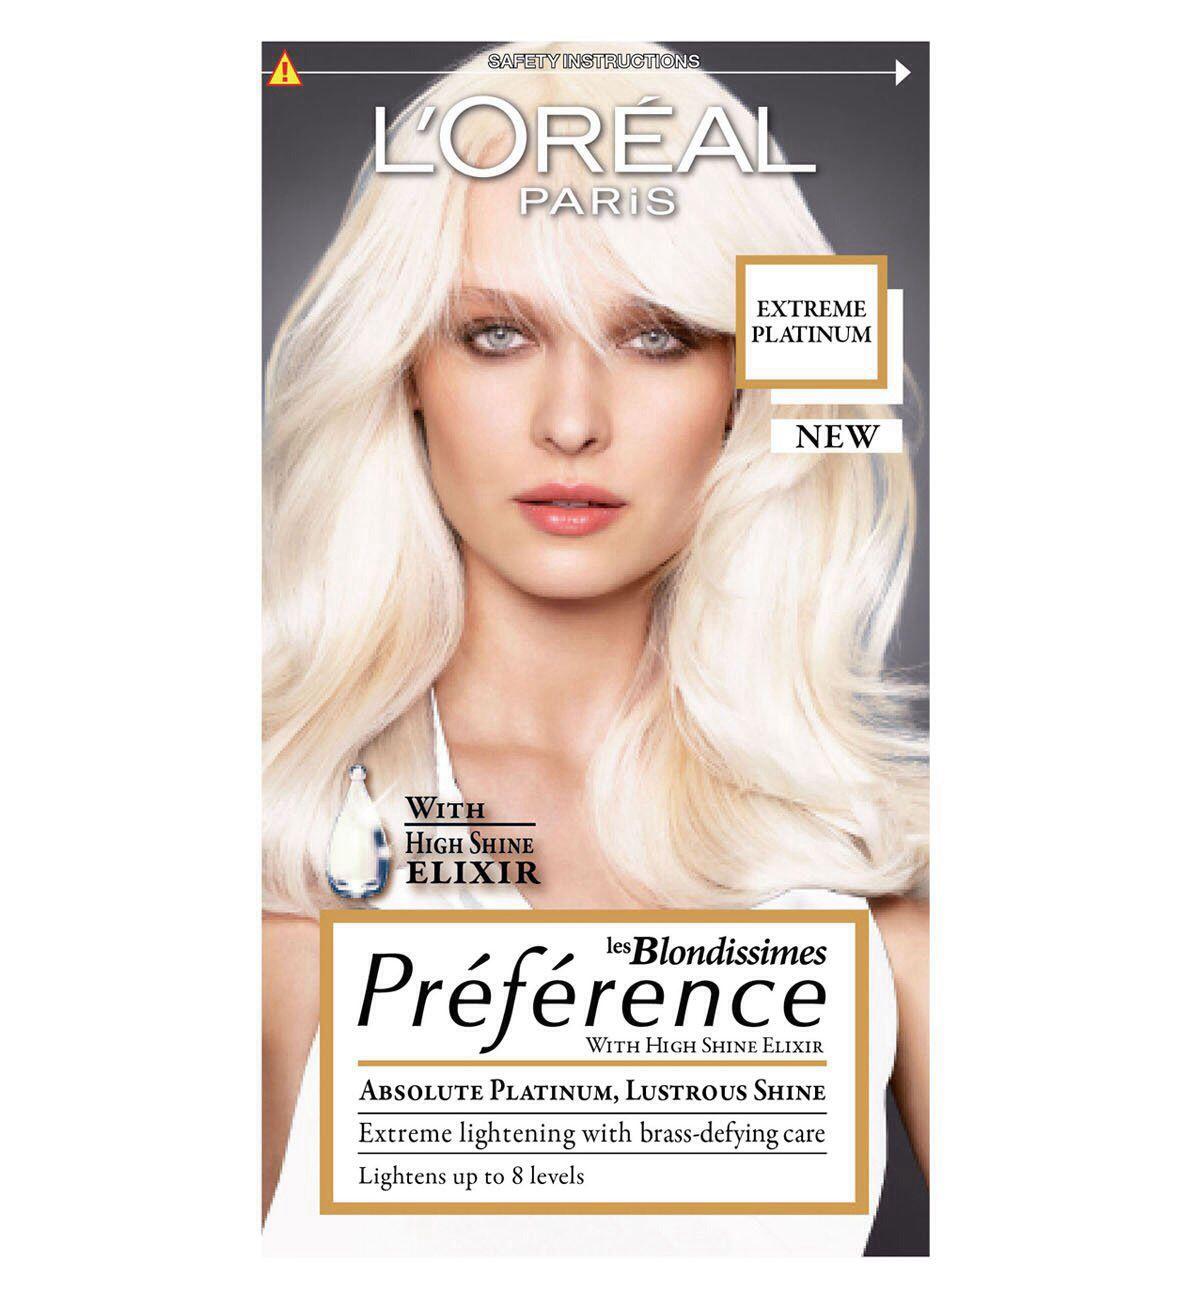 Platinum Blonde 8 Shades Lighter Hair Dye By Feria Loreal Loreal Paris Lasting Hair Color